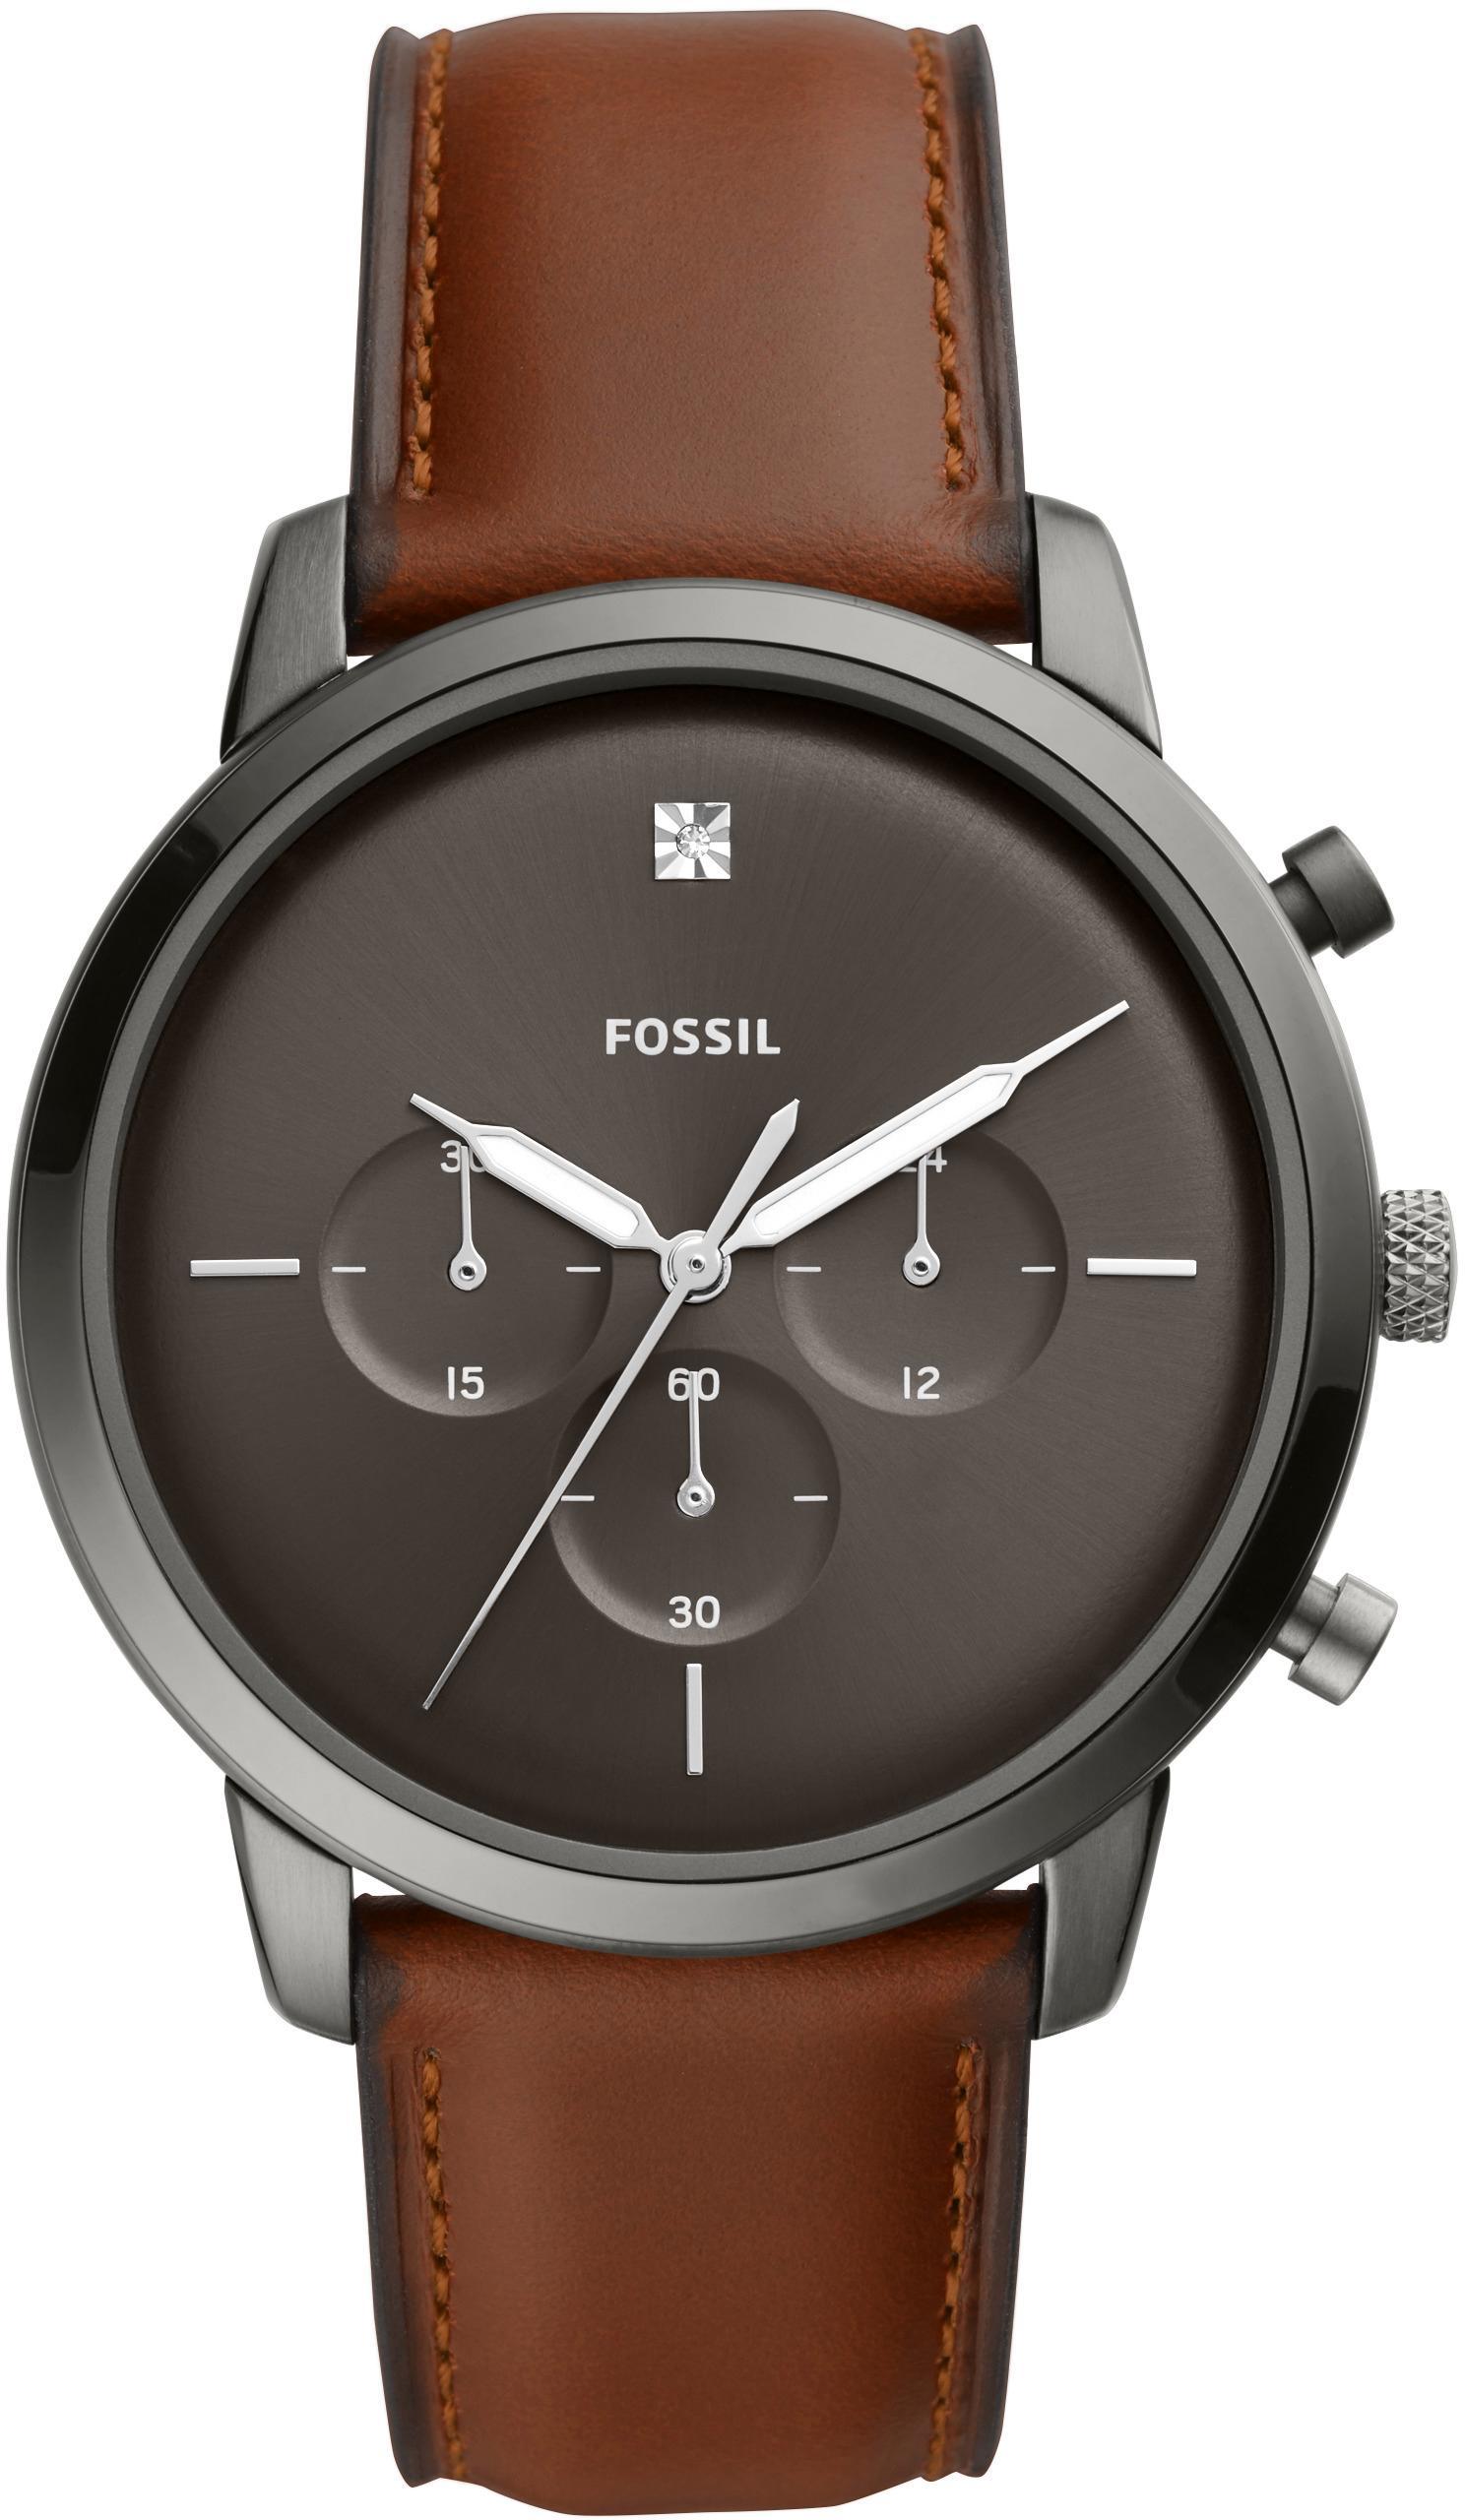 Fossil Chronograph NEUTRA CHRONO FS5582   Uhren   Braun   Fossil